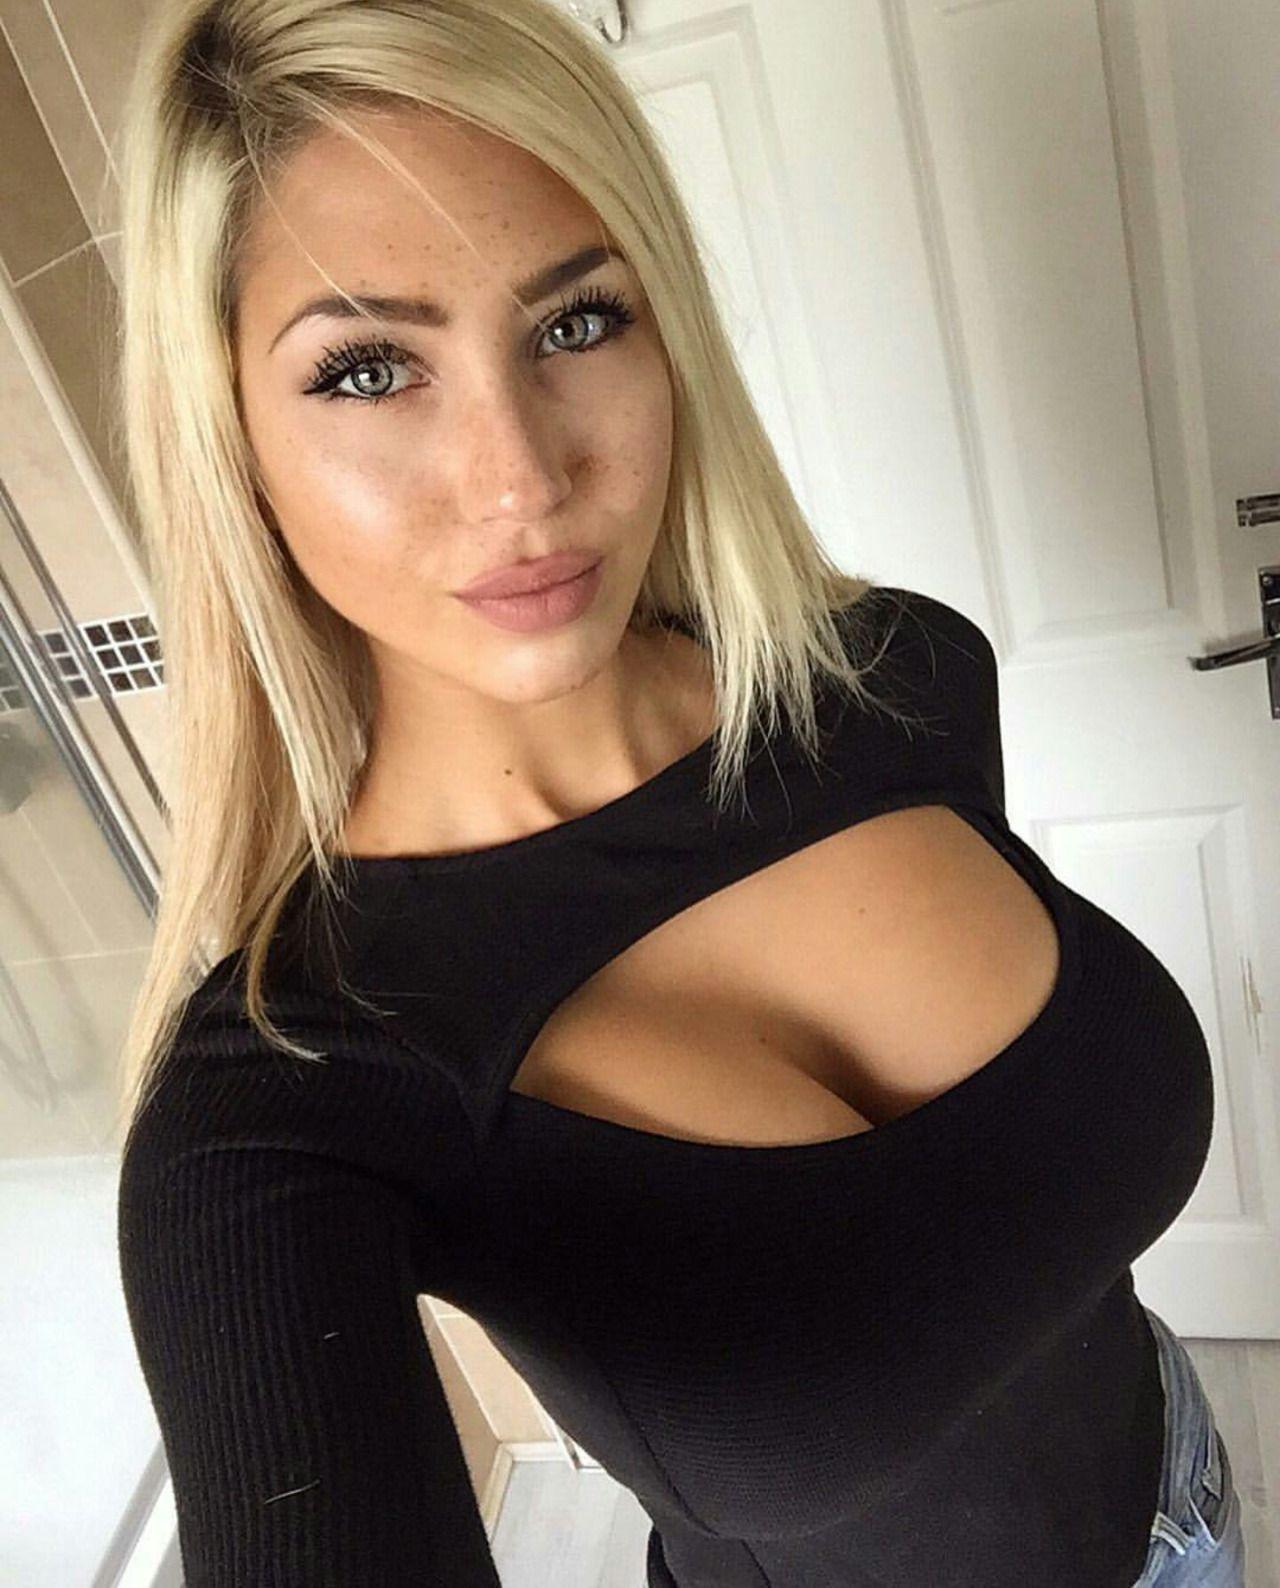 Petite Blonde Tits